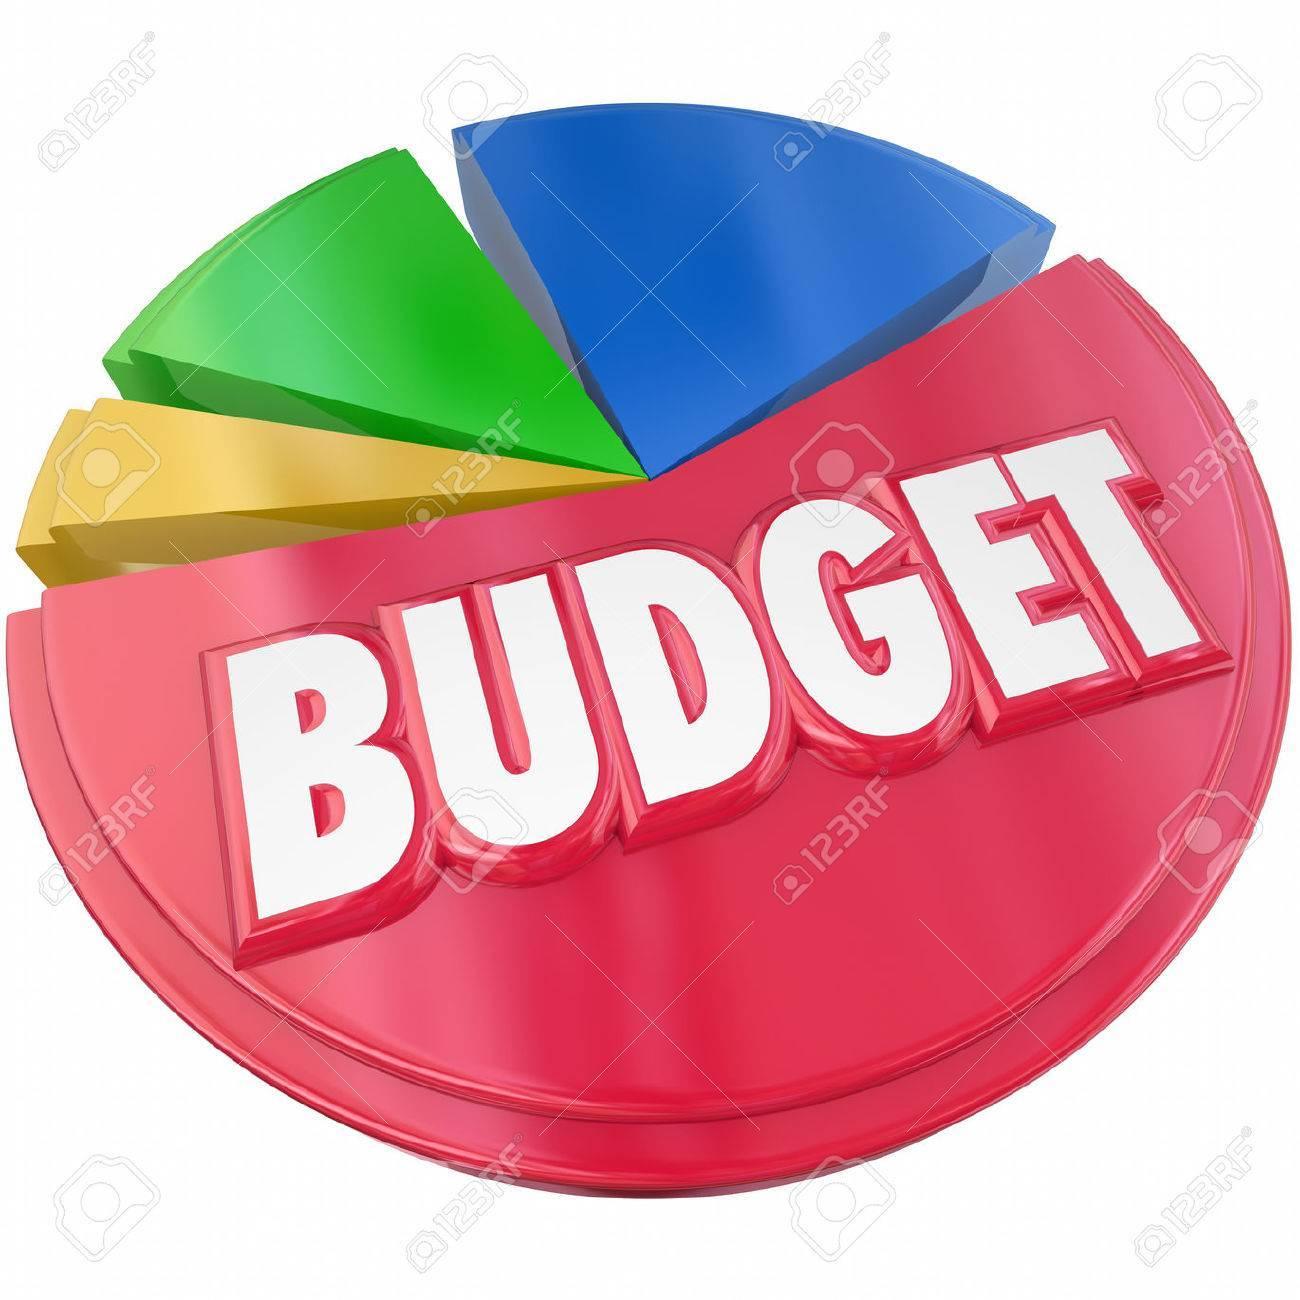 Budget plan clipart » Clipart Portal.